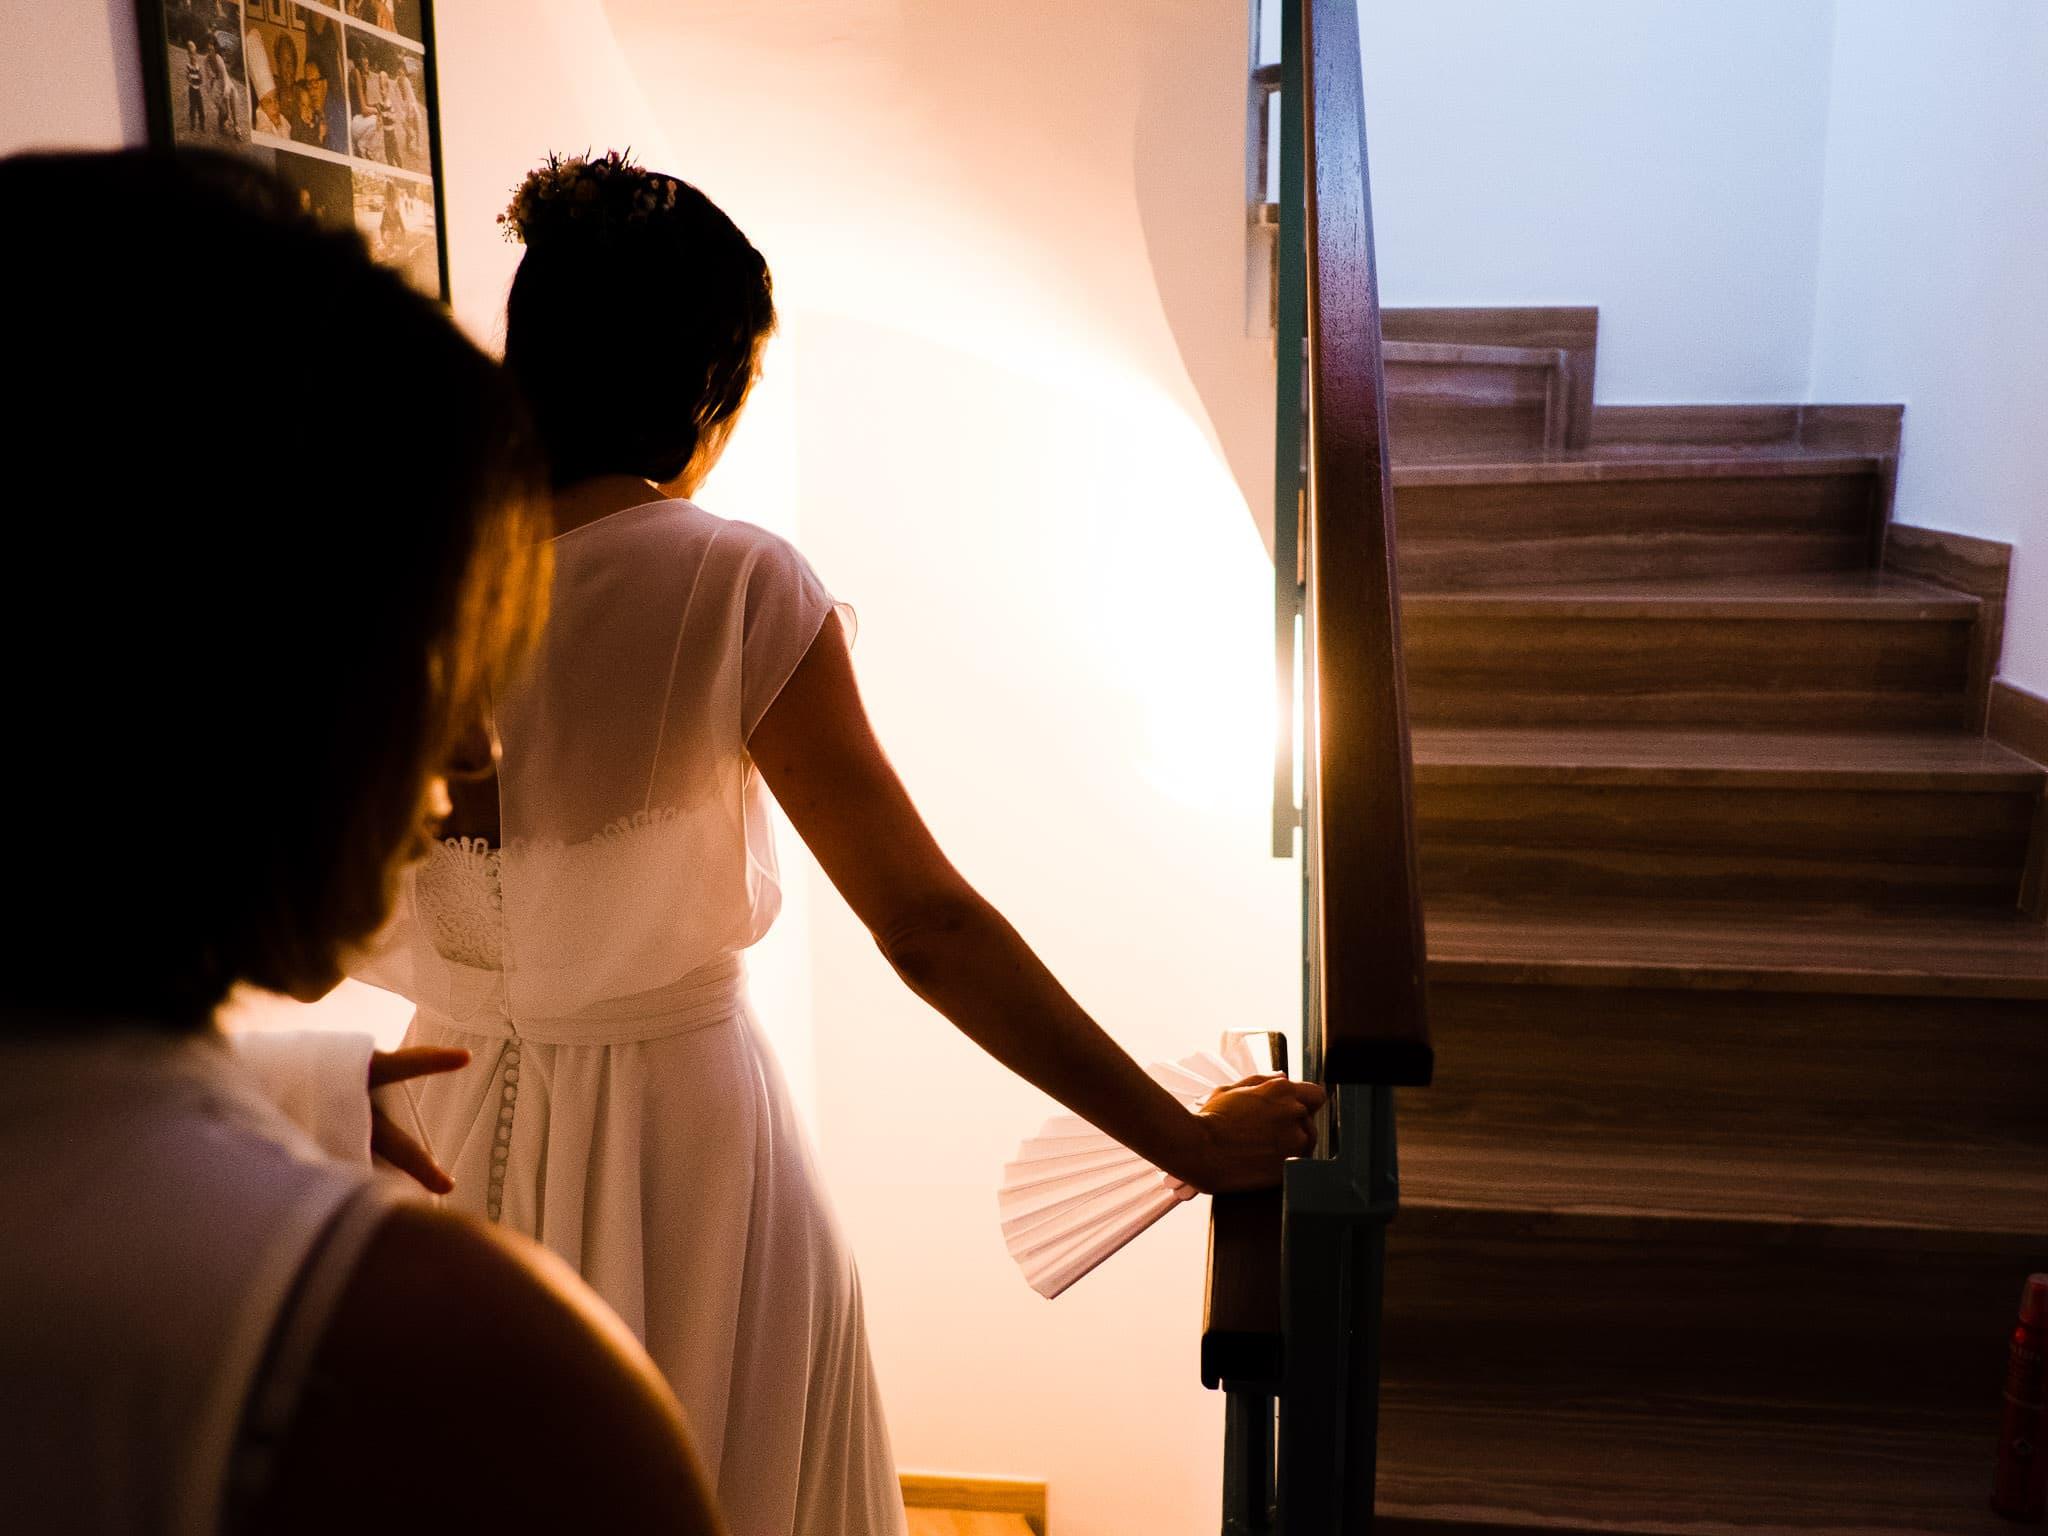 fotografo matrimonio lucarossifoto varese sacro monte Mulino dellOlio 17